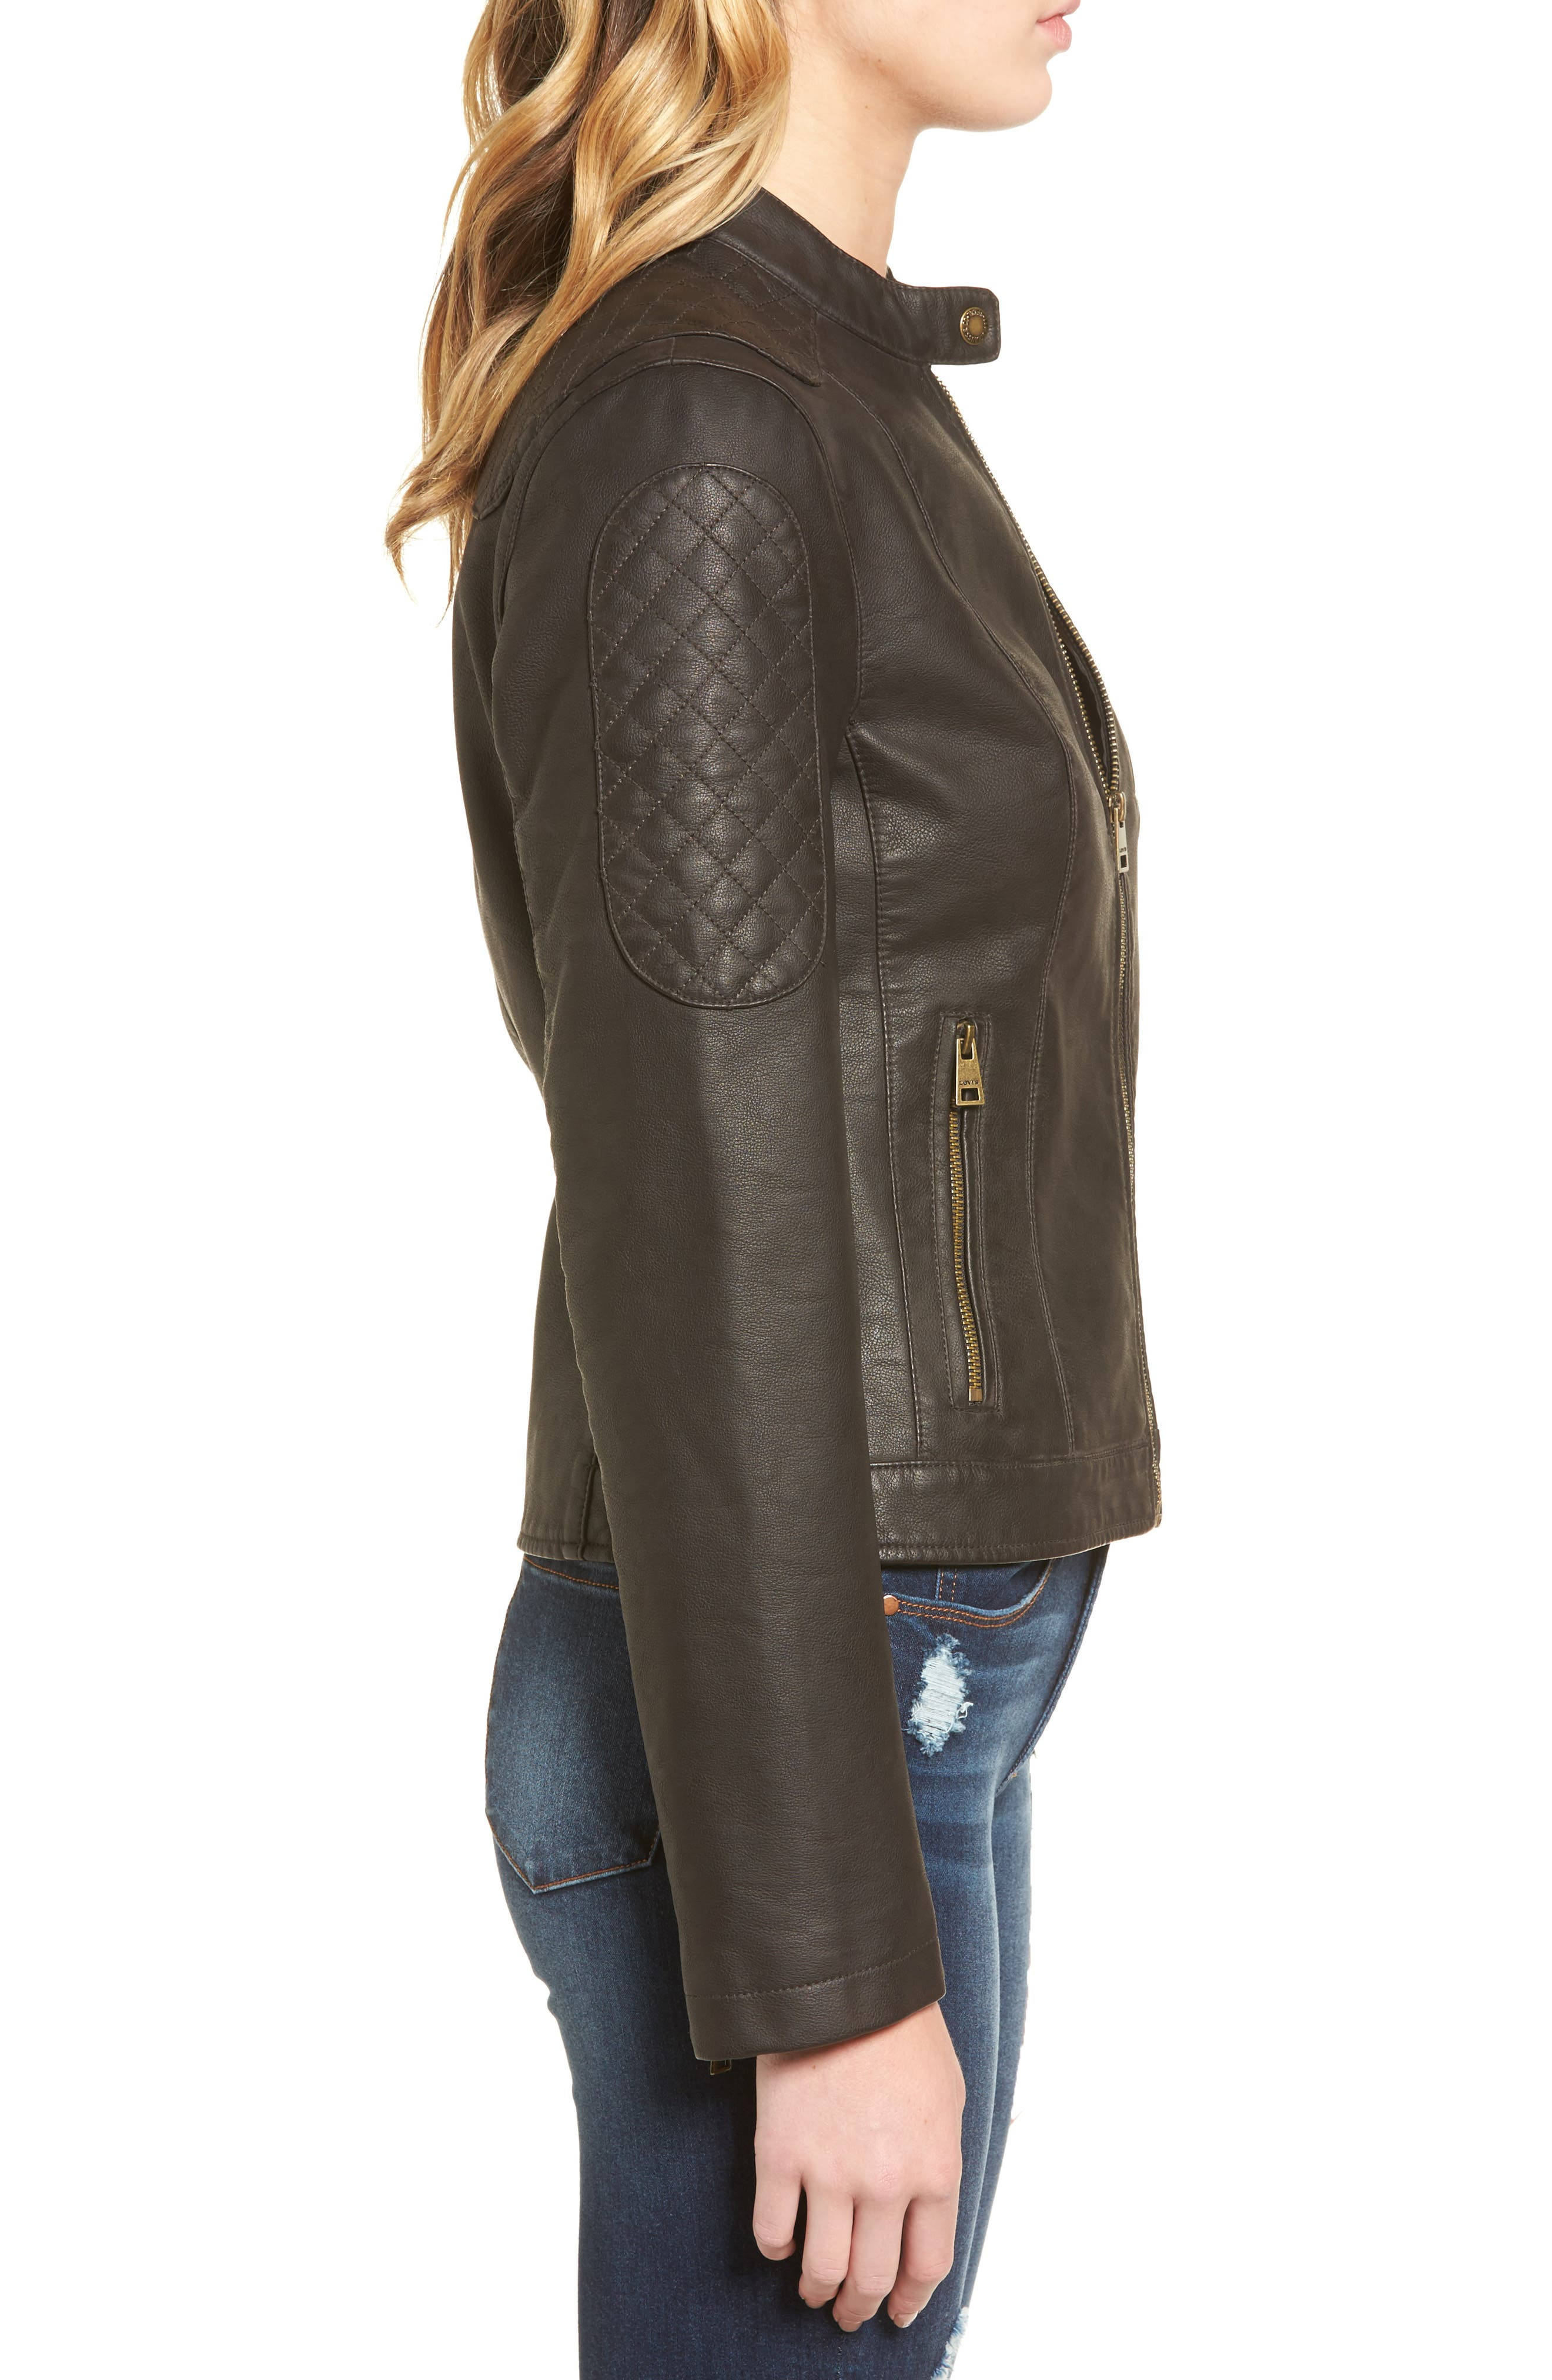 LEVIS<sup>®</sup> Faux Leather Moto Jacket,                             Alternate thumbnail 3, color,                             Brown